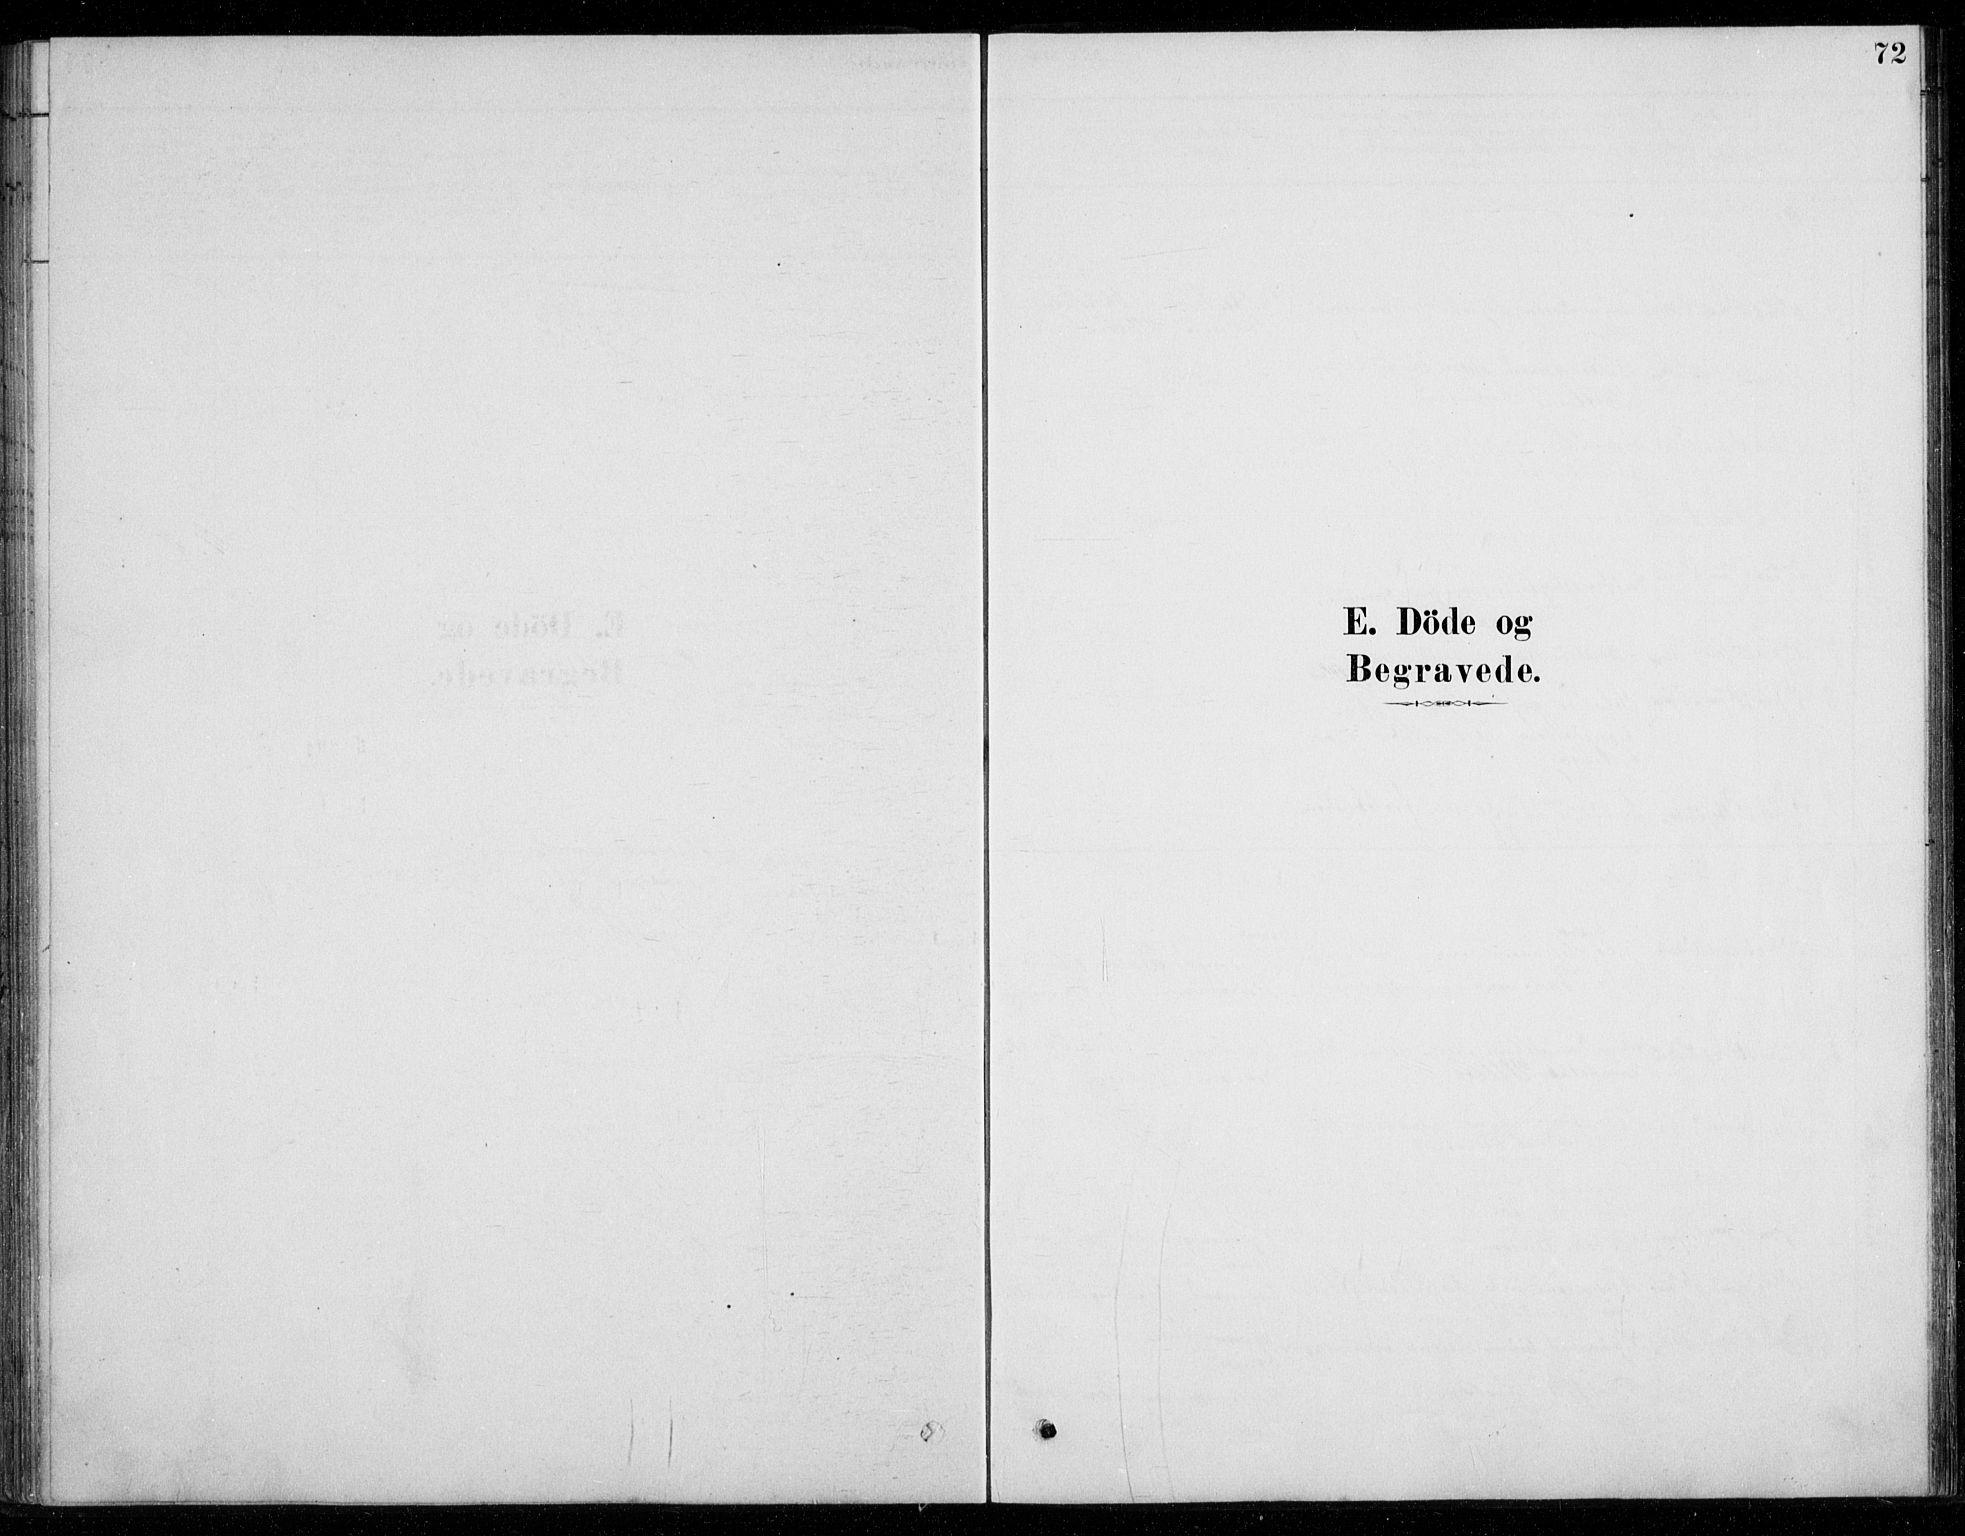 SAO, Fet prestekontor Kirkebøker, G/Gb/L0002: Klokkerbok nr. II 2, 1878-1911, s. 72